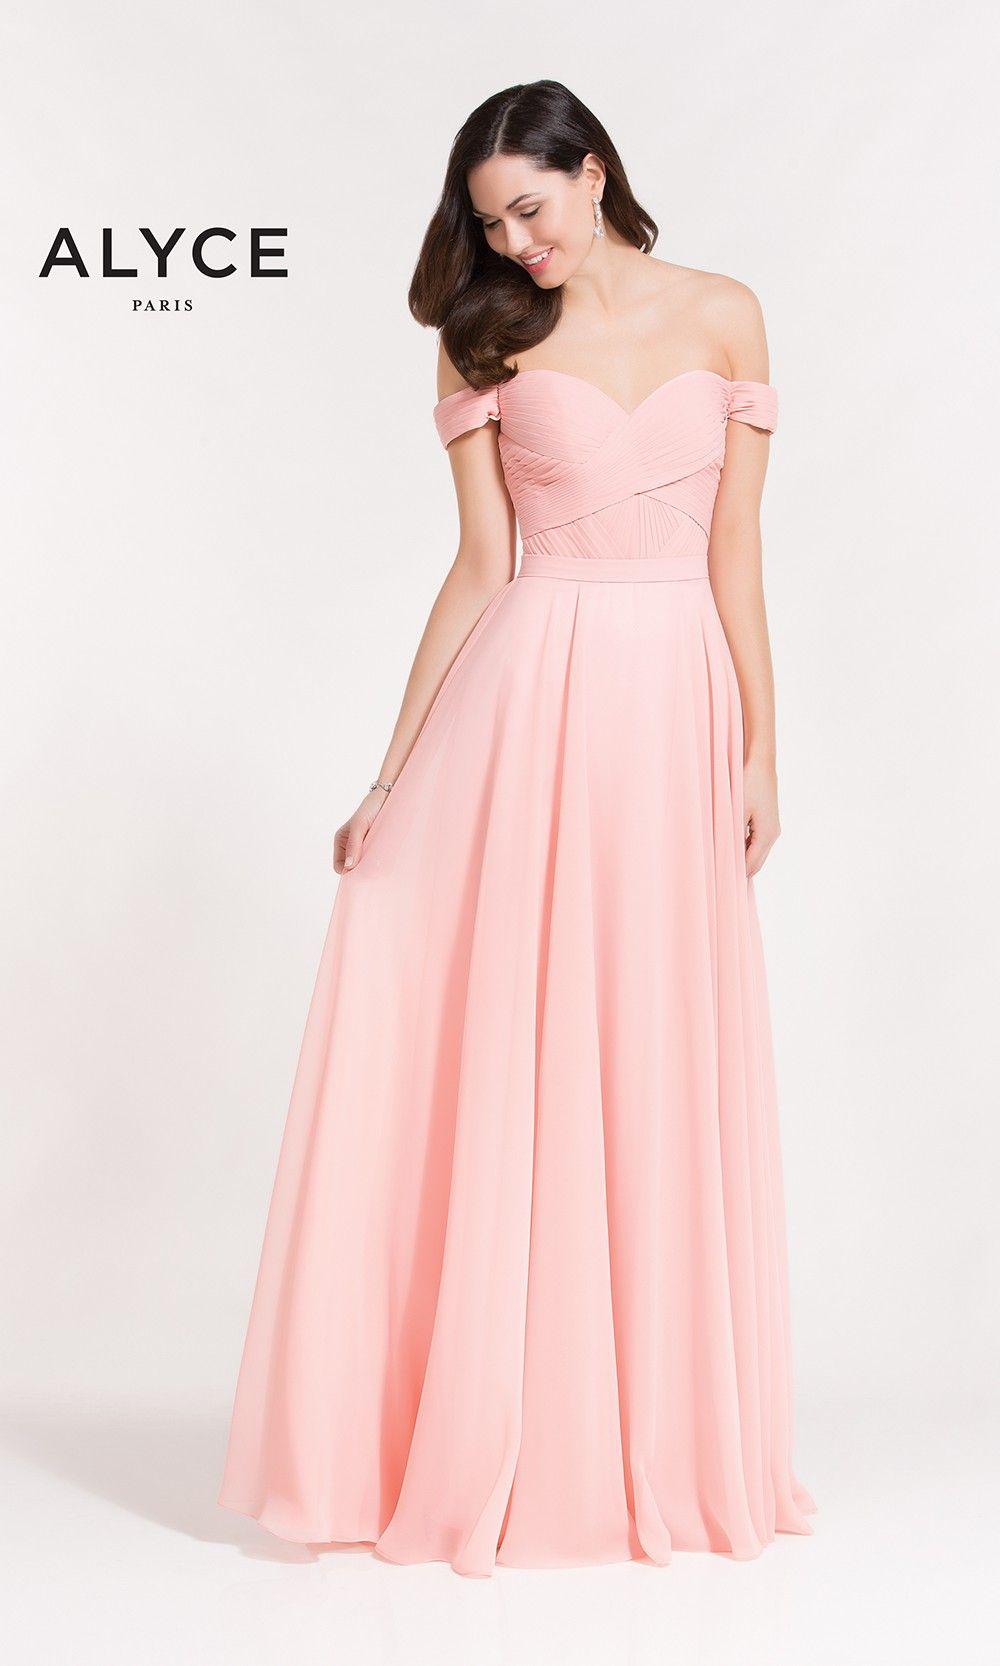 Alyce Paris Mother of the Bride | Dress Style 27184 | Alyce Paris ...